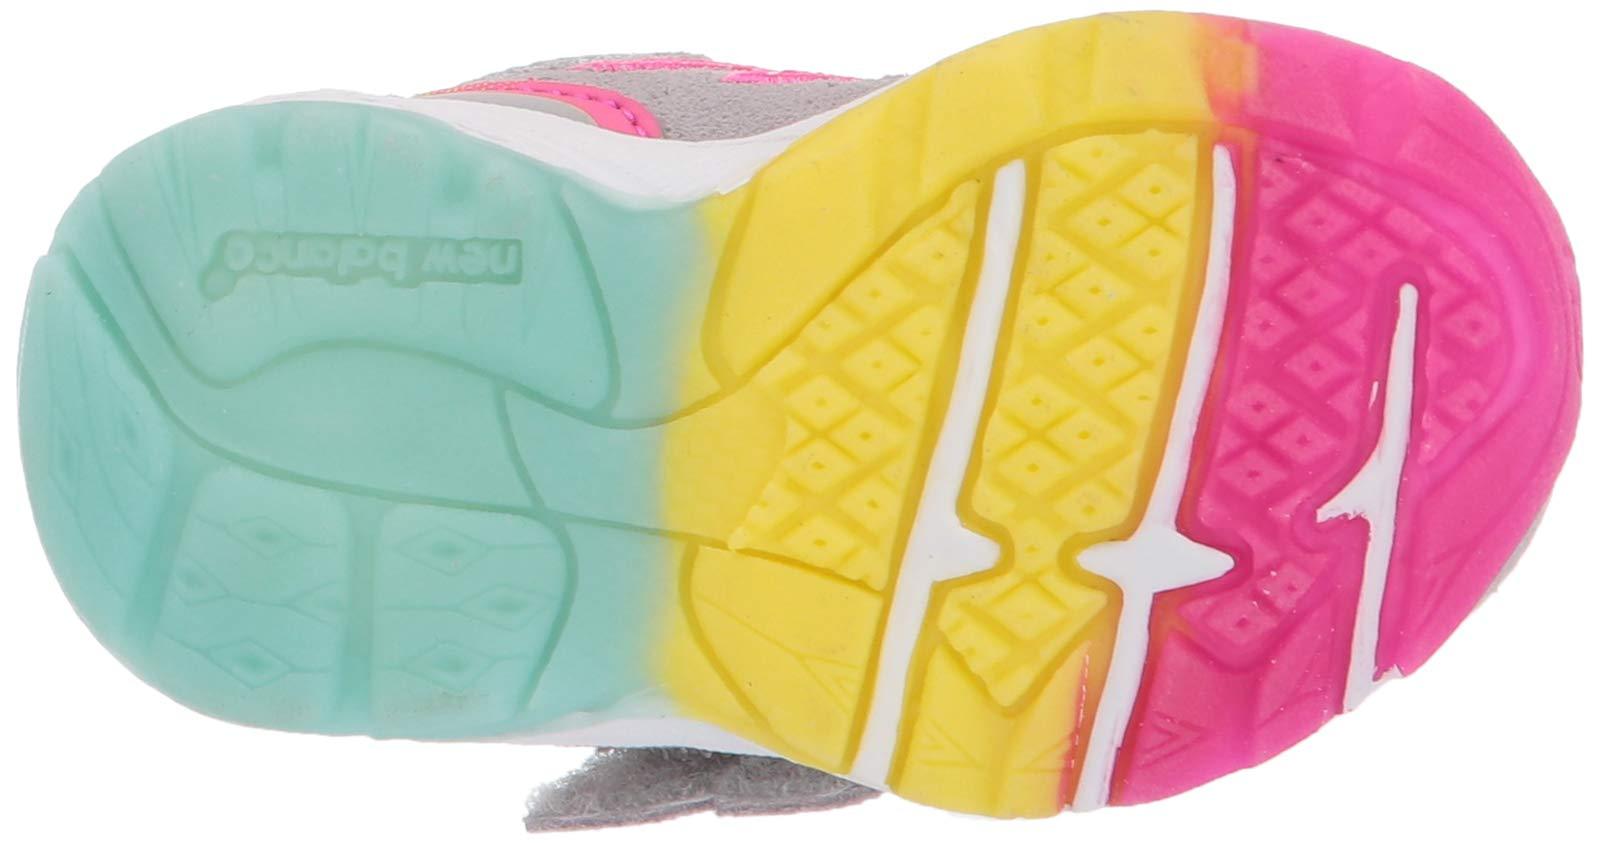 New Balance Girls' 888v2 Hook and Loop Running Shoe, Grey/Rainbow, 2 W US Infant by New Balance (Image #3)